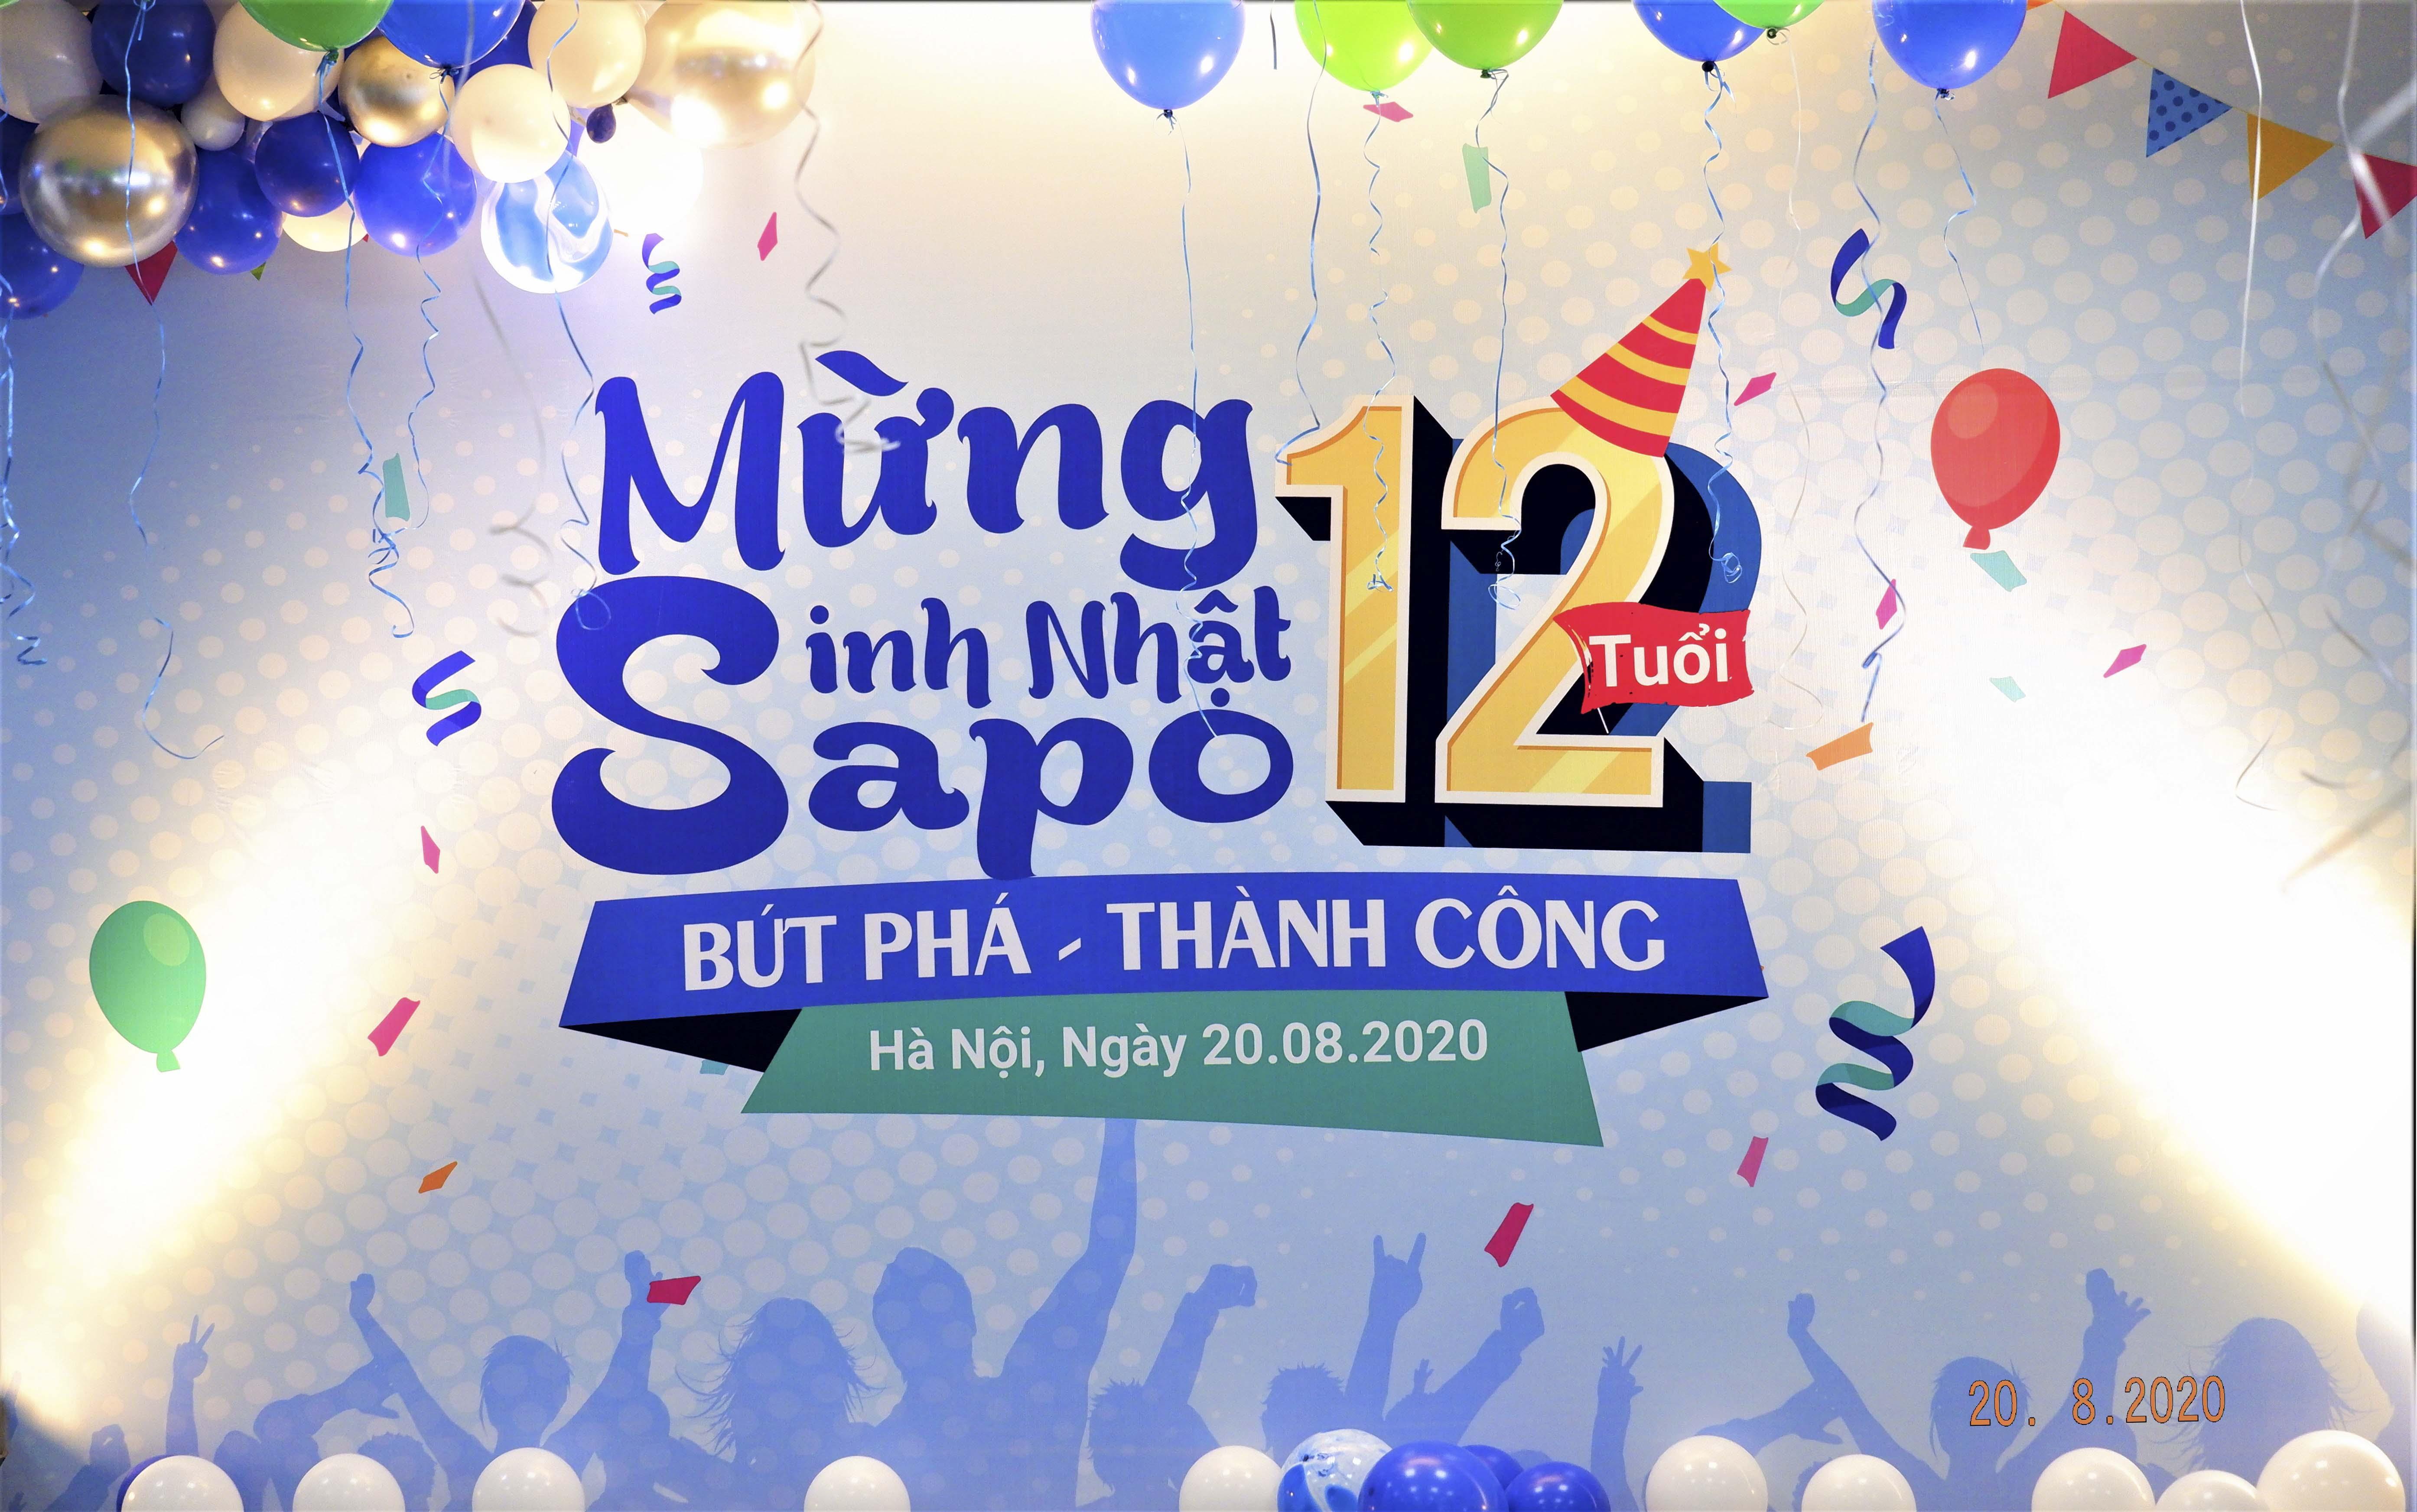 [Toàn cảnh Sapo 3 miền trong lễ kỷ niệm sinh nhật Sapo 12 tuổi]